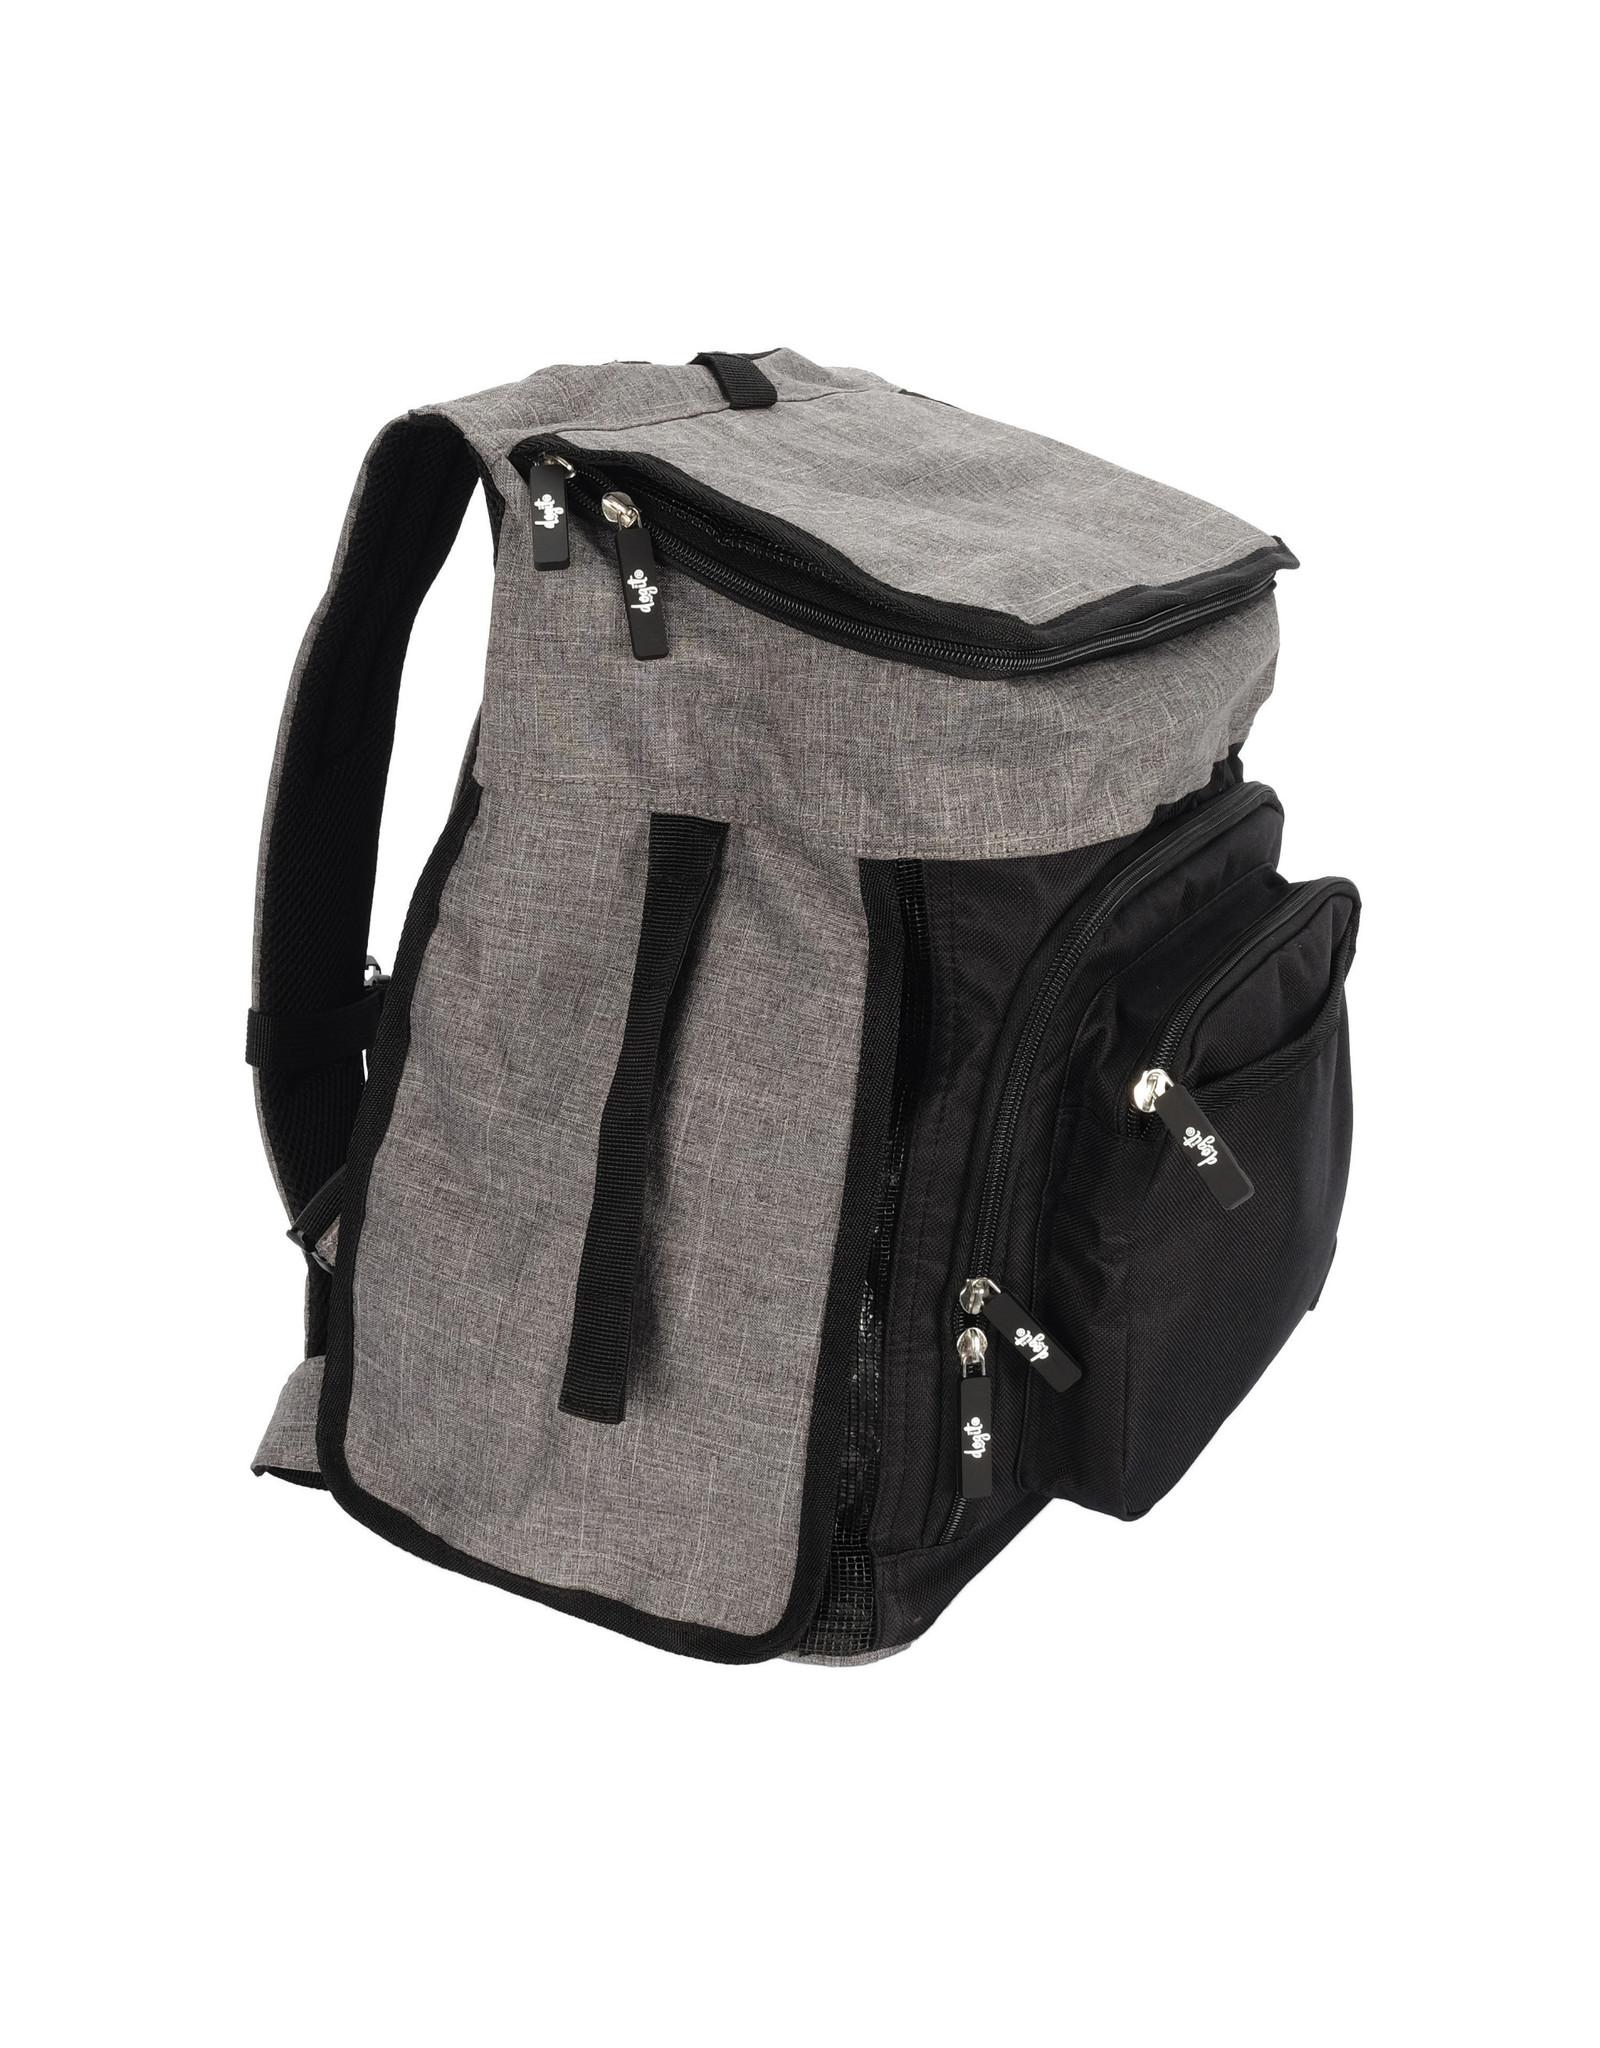 DogIt Soft Carrier Backpack Carrier Gray